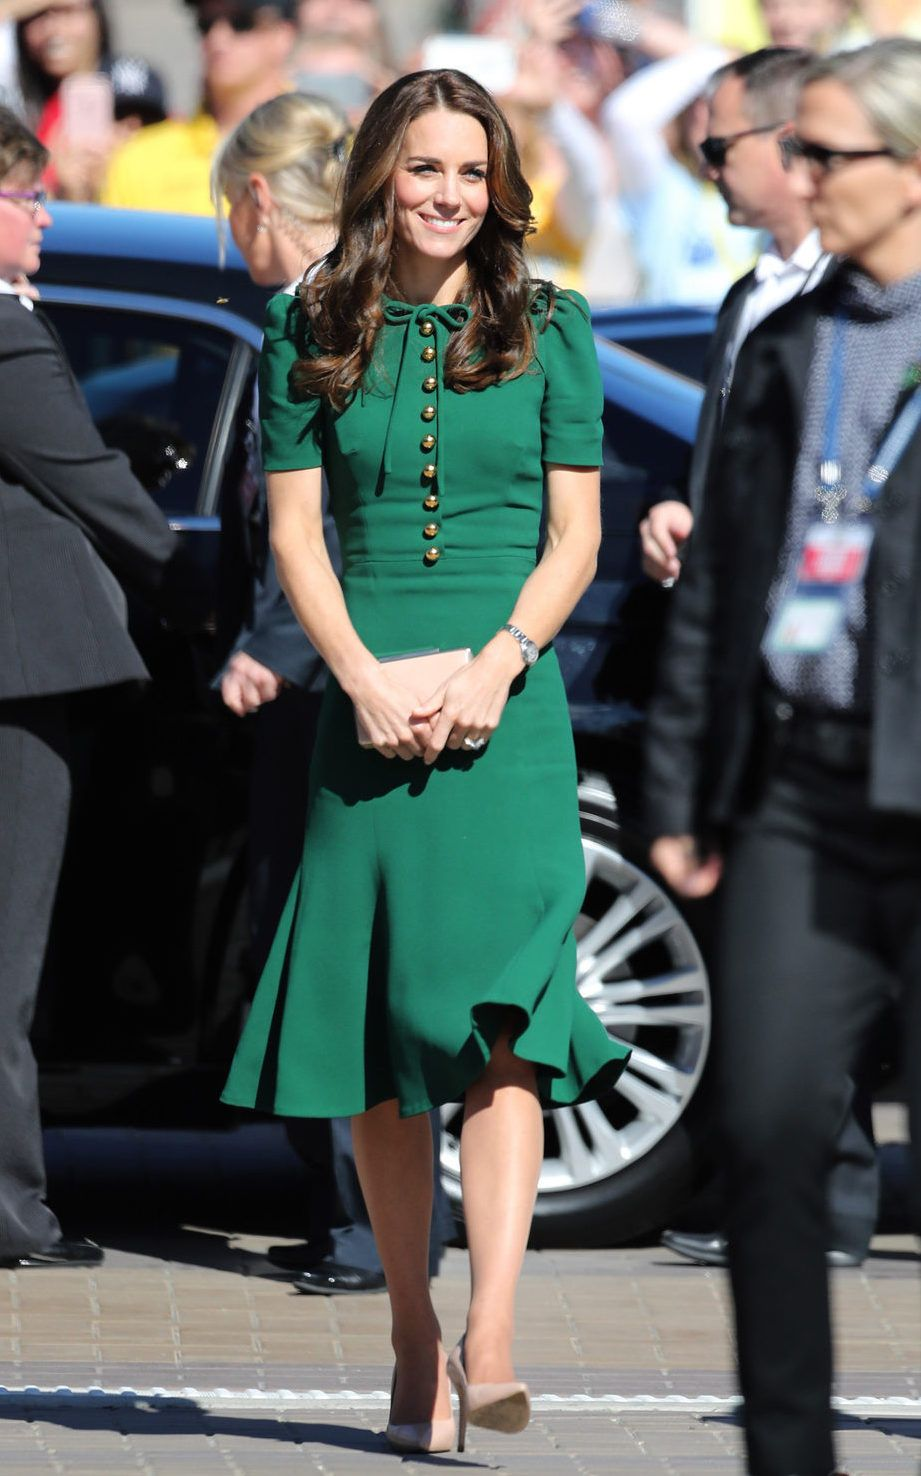 Vestido Verde Dolce Gabbana De Kate Middleton Em 2019